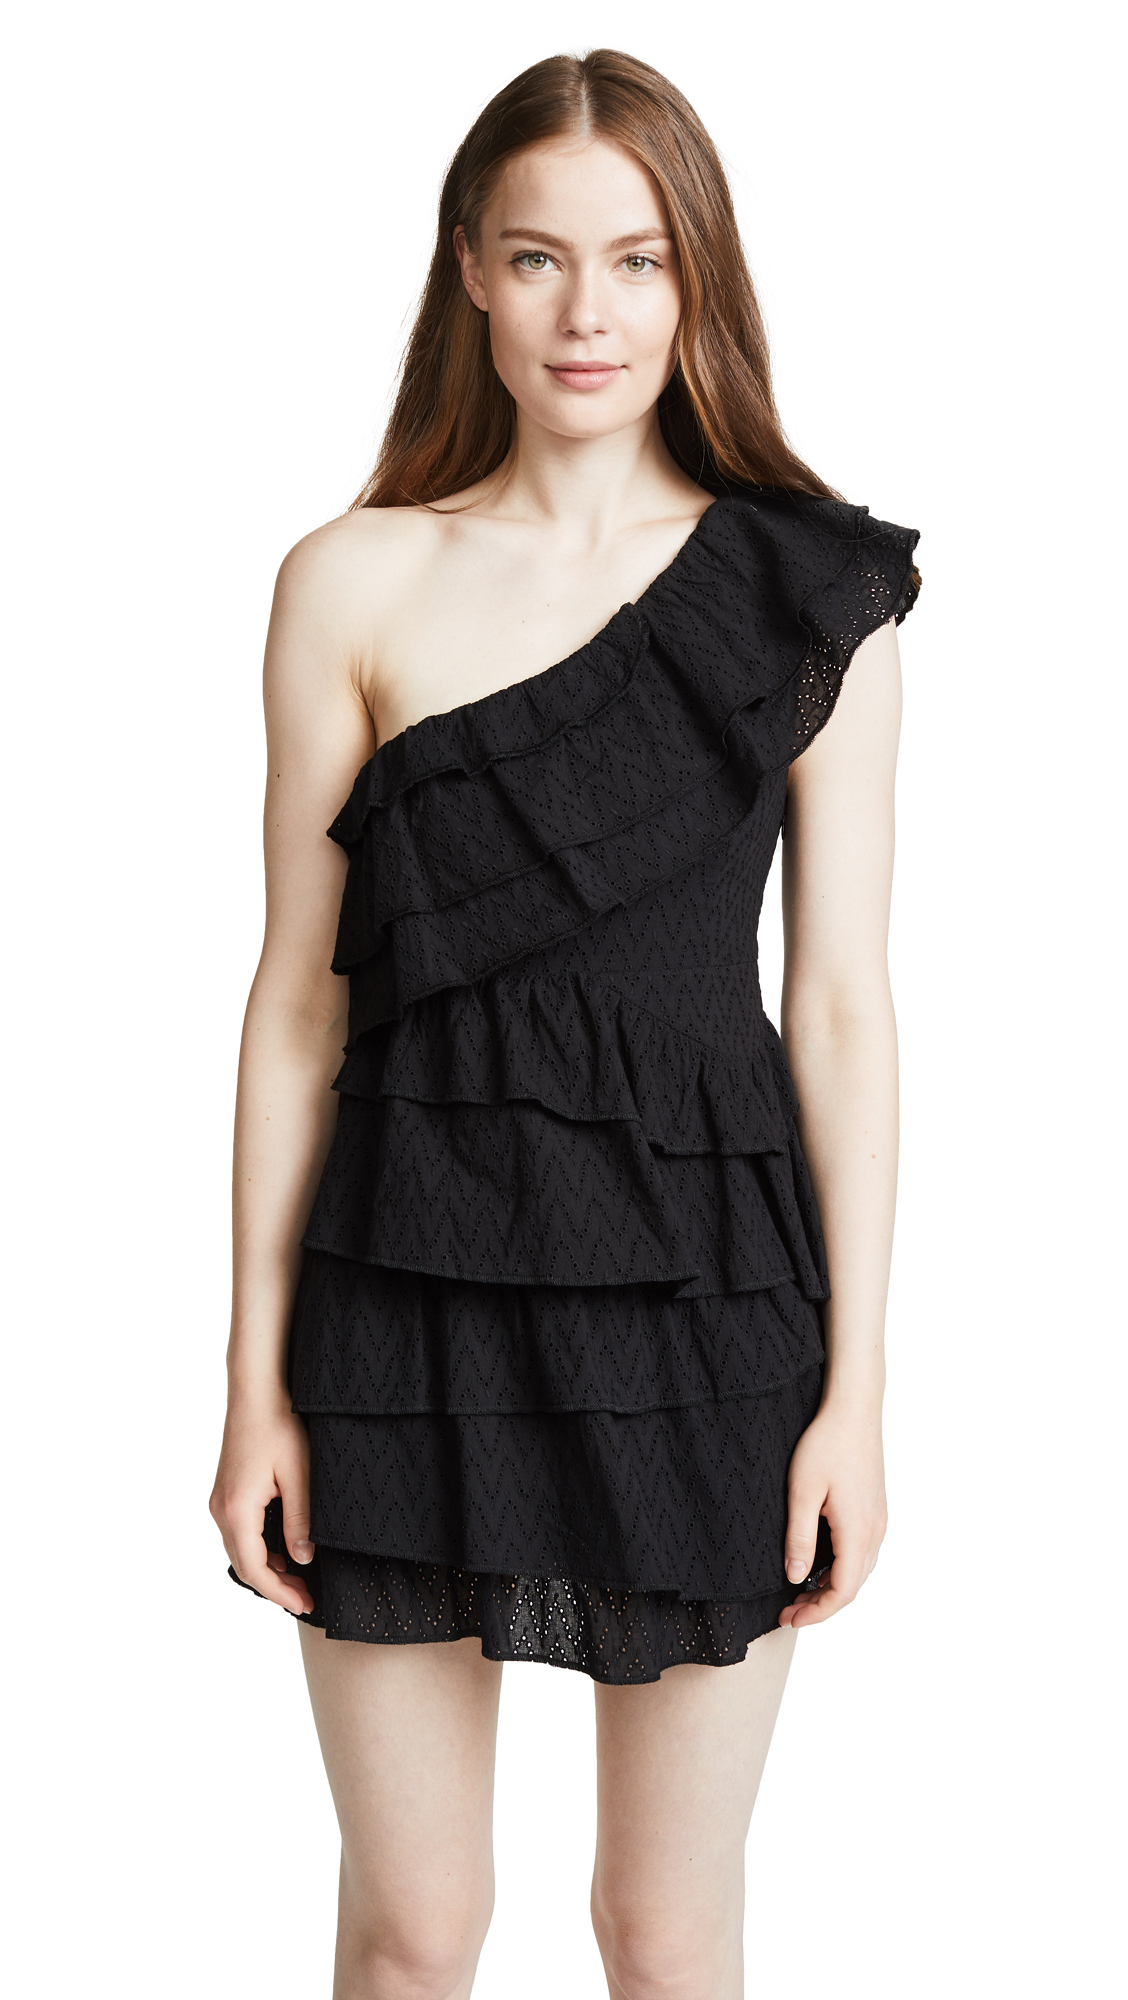 NIGHTWALKER Gina Dress in Black